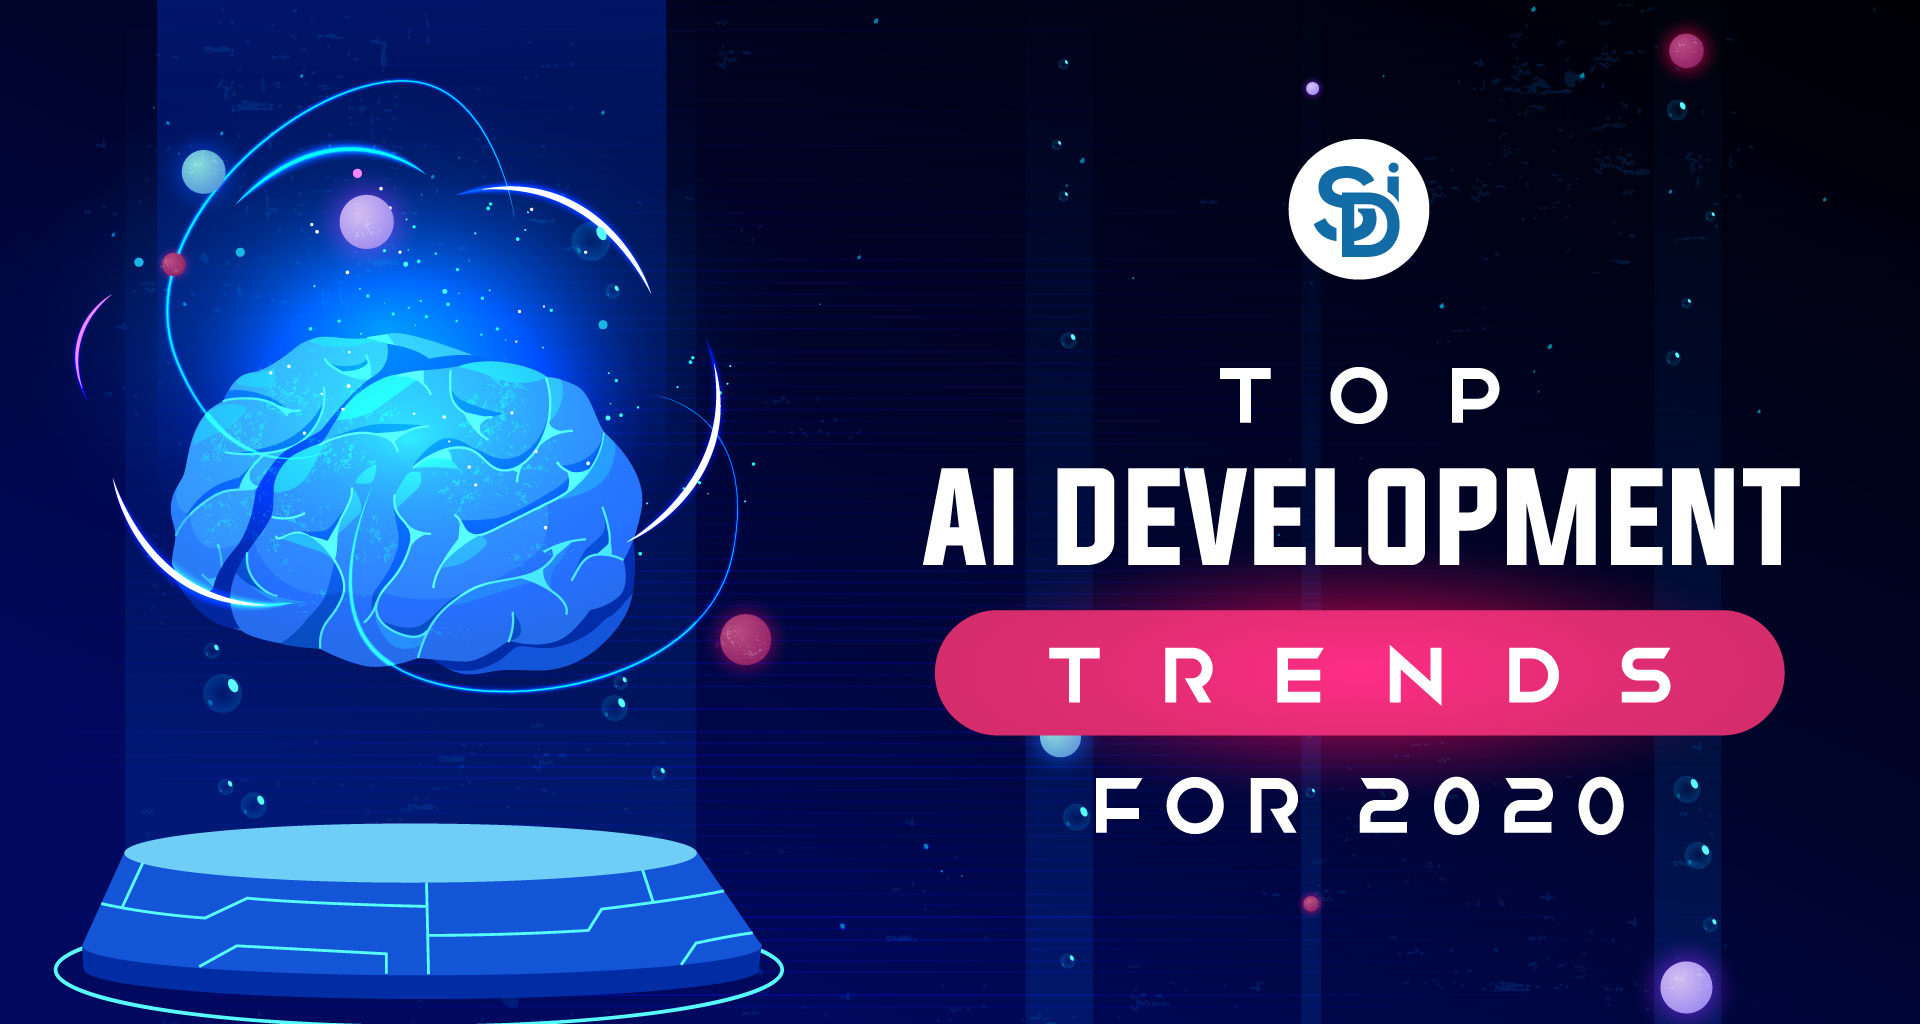 AI Development Trends 2020